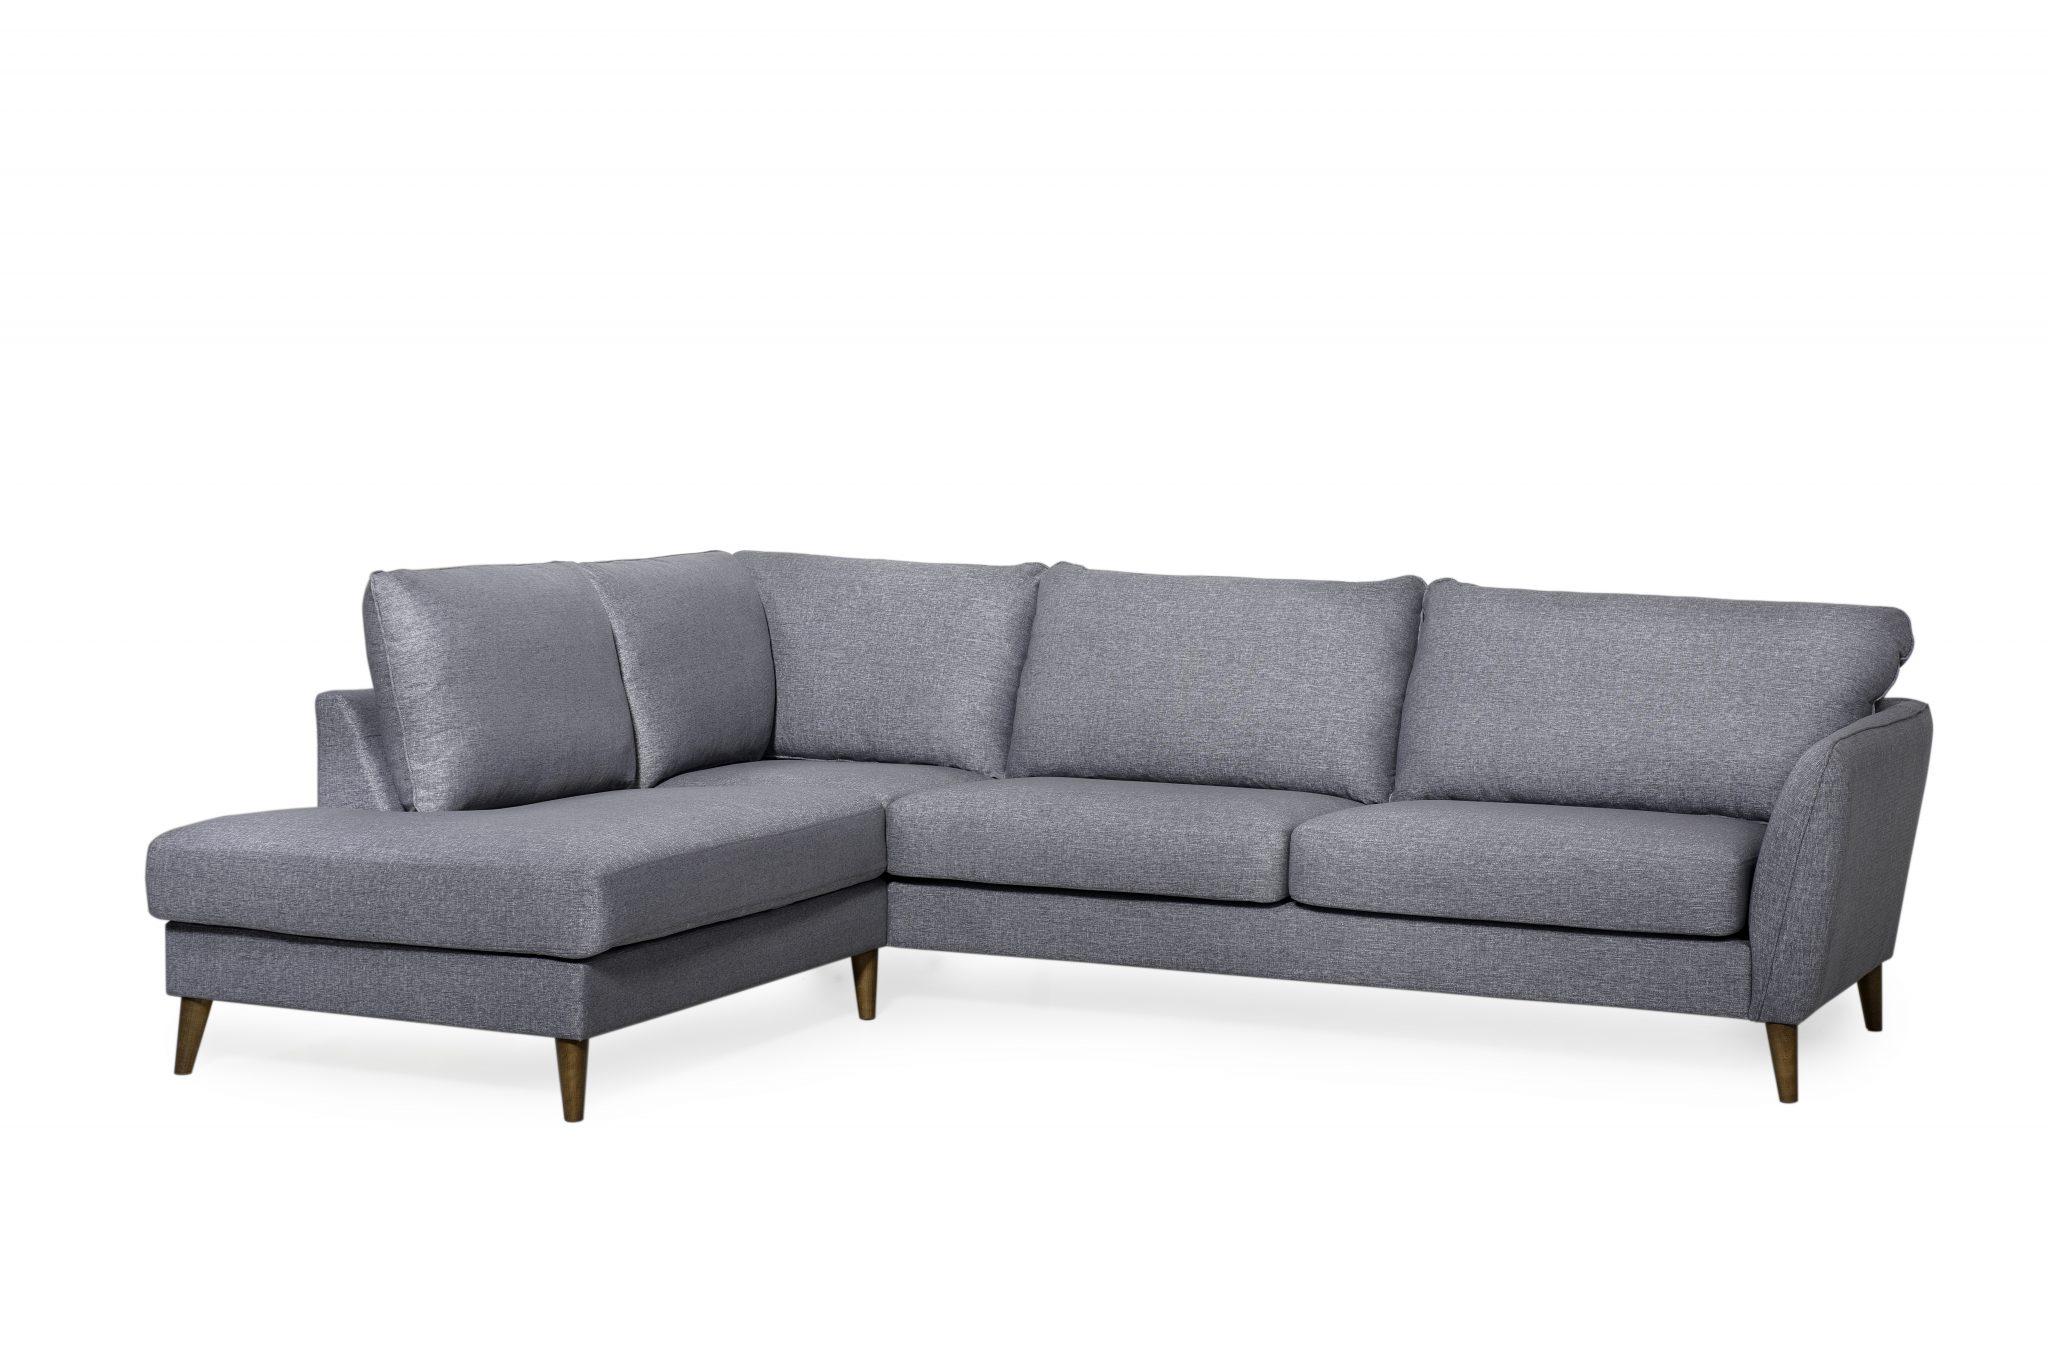 HARLOW sofa scandinavian style softnord 1 Softnord